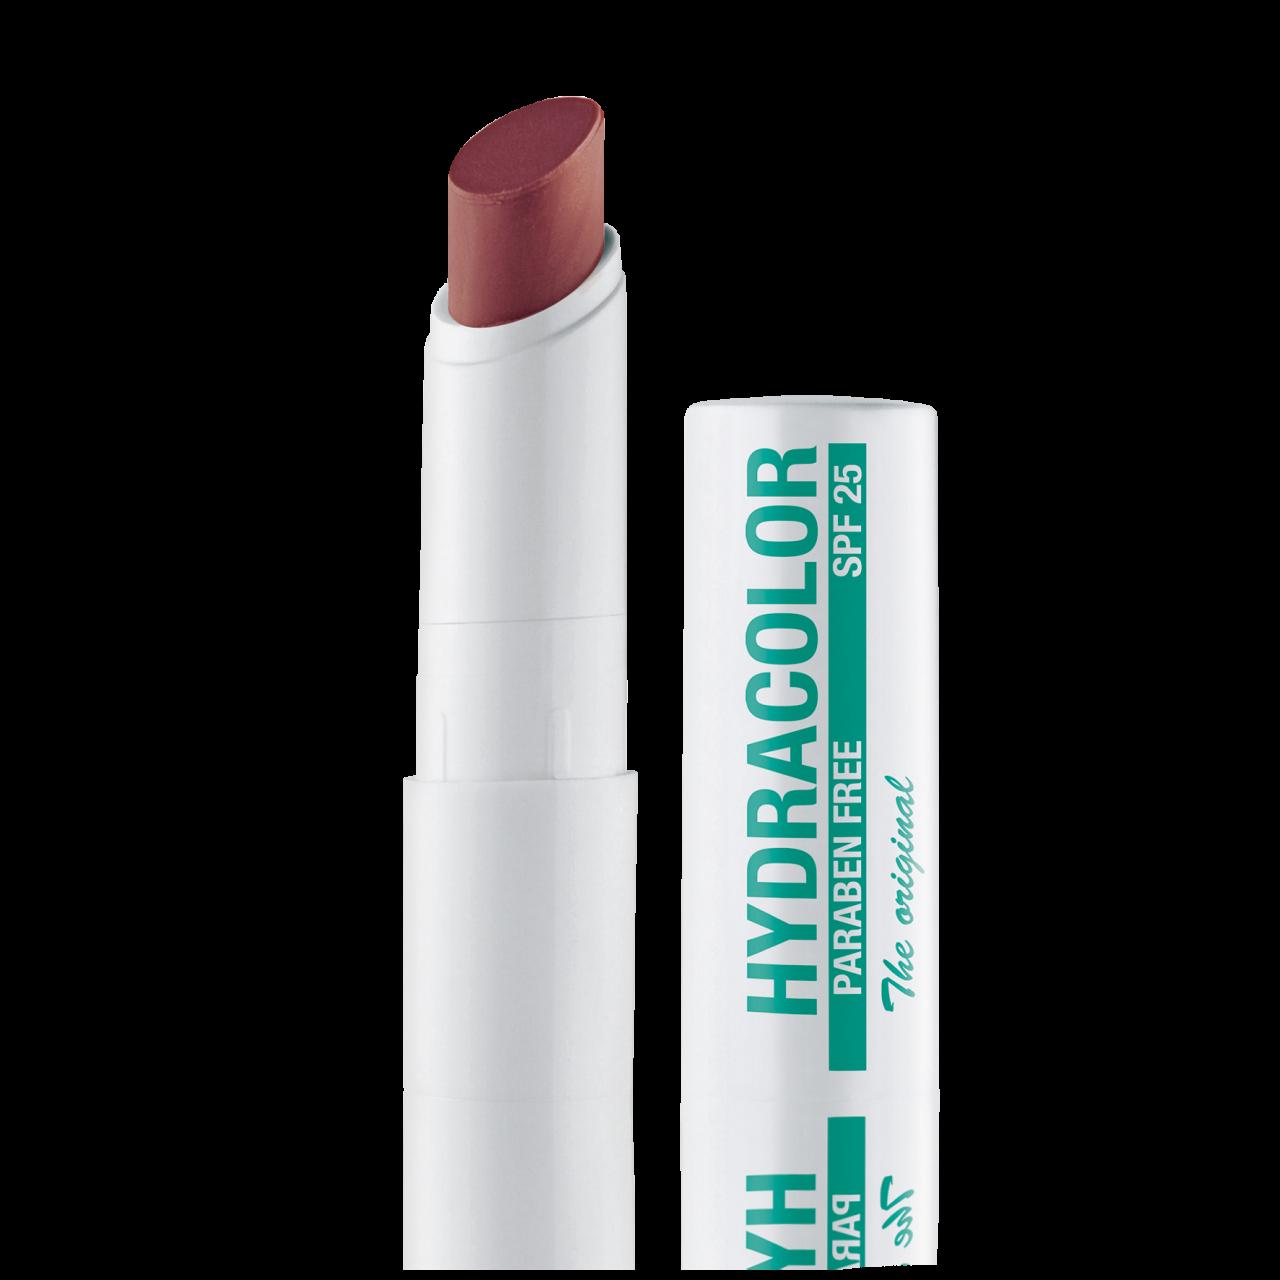 Lippenpflegestift glicine 25